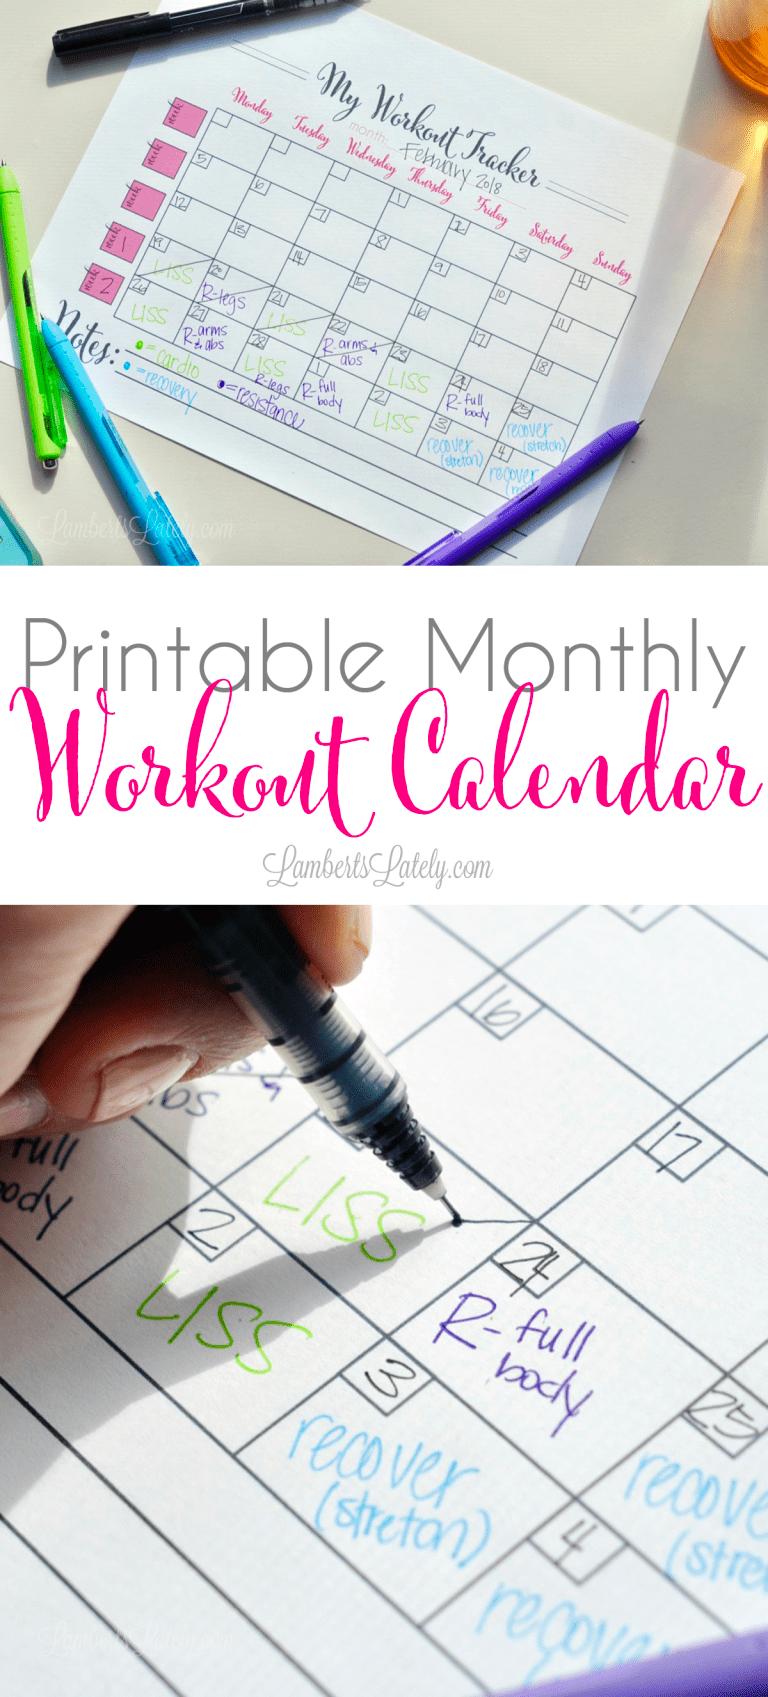 Printable Monthly Workout Calendar Workout calendar